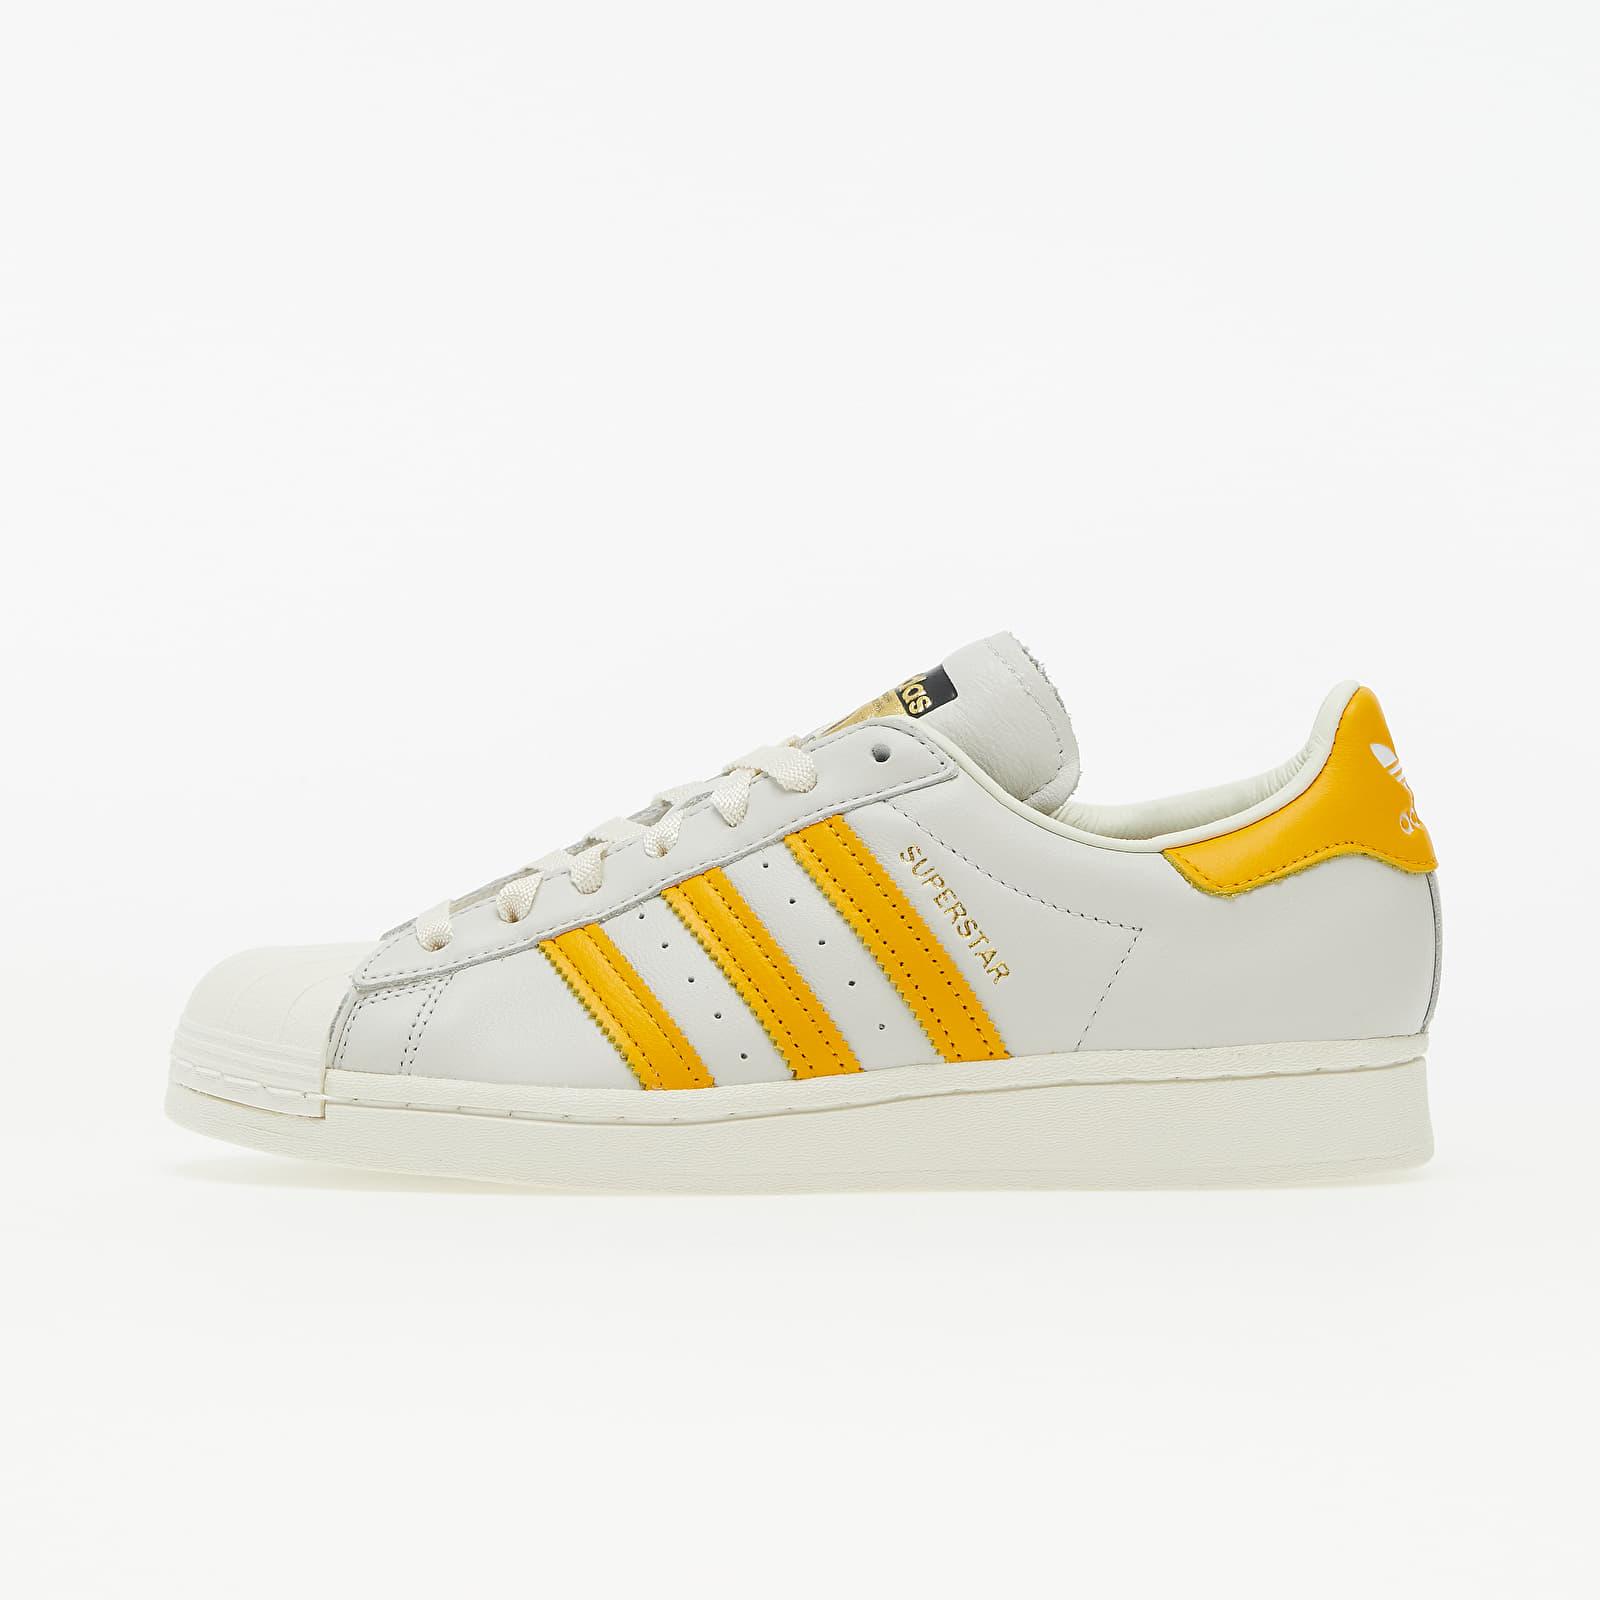 adidas Superstar Off White/ Collegiate Gold/ Off White EUR 42